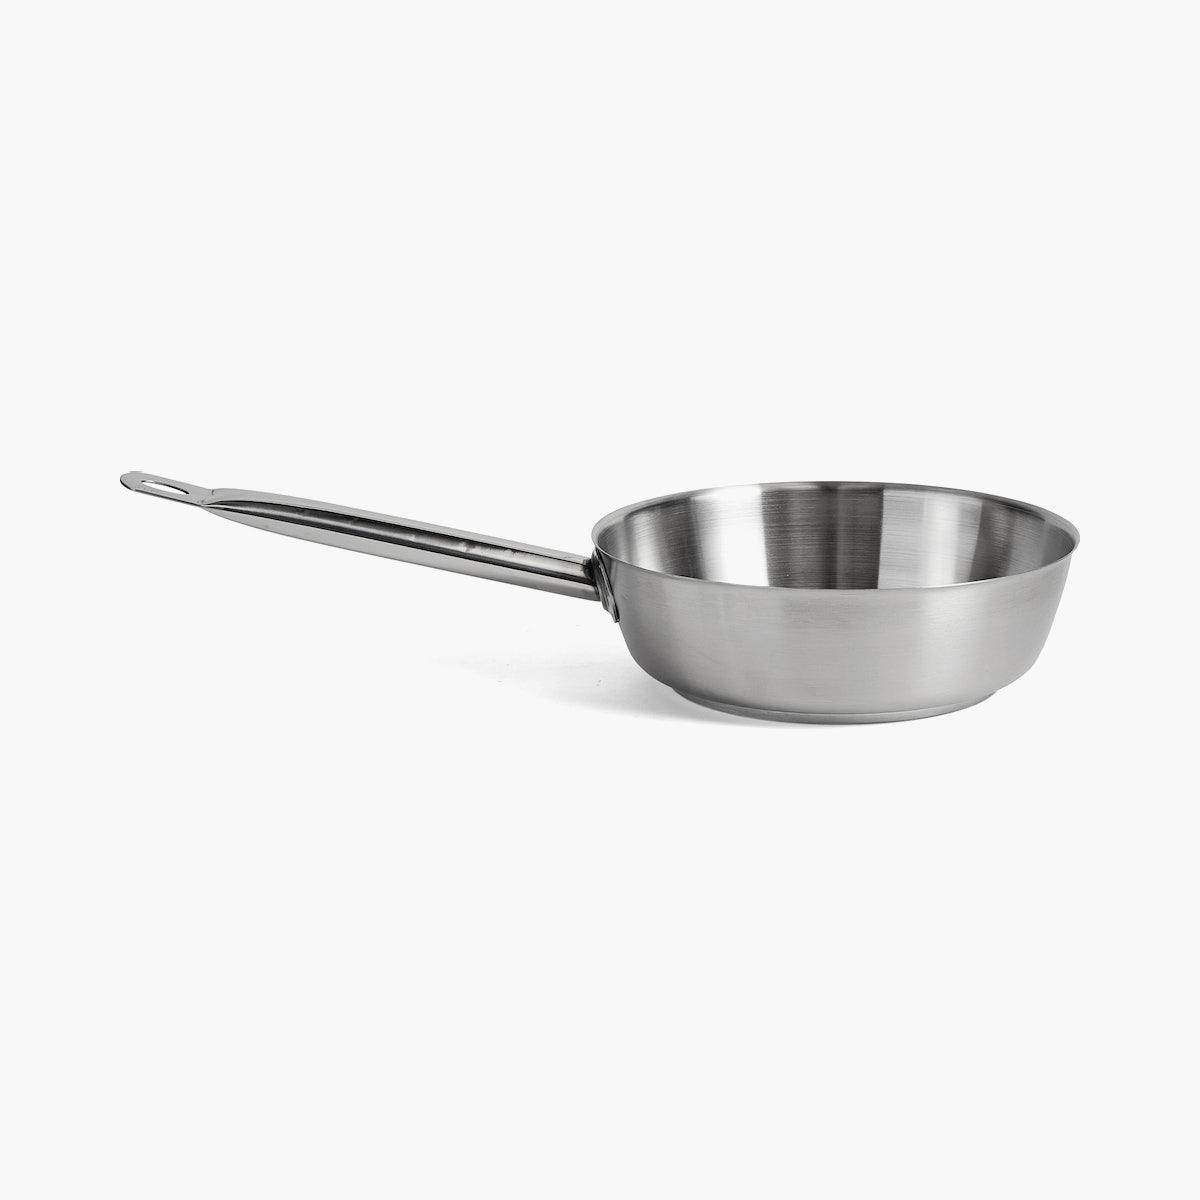 Conical Saute Pan